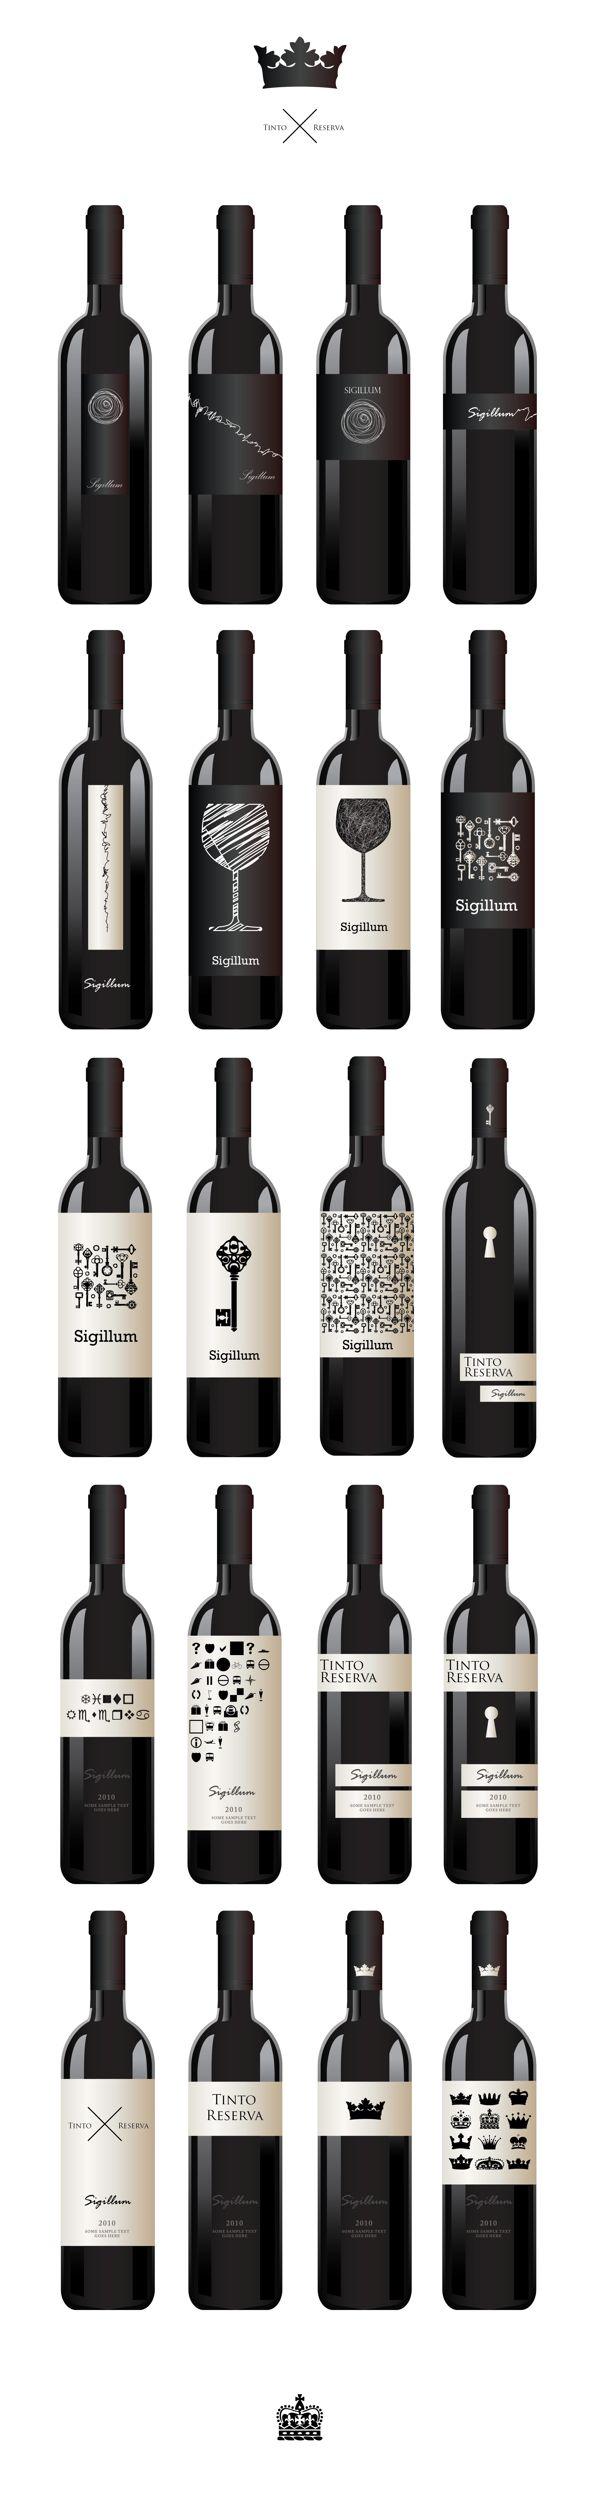 бренд Sigillum, República Portuguesa by Дмитрий Ерофеев, via Behance